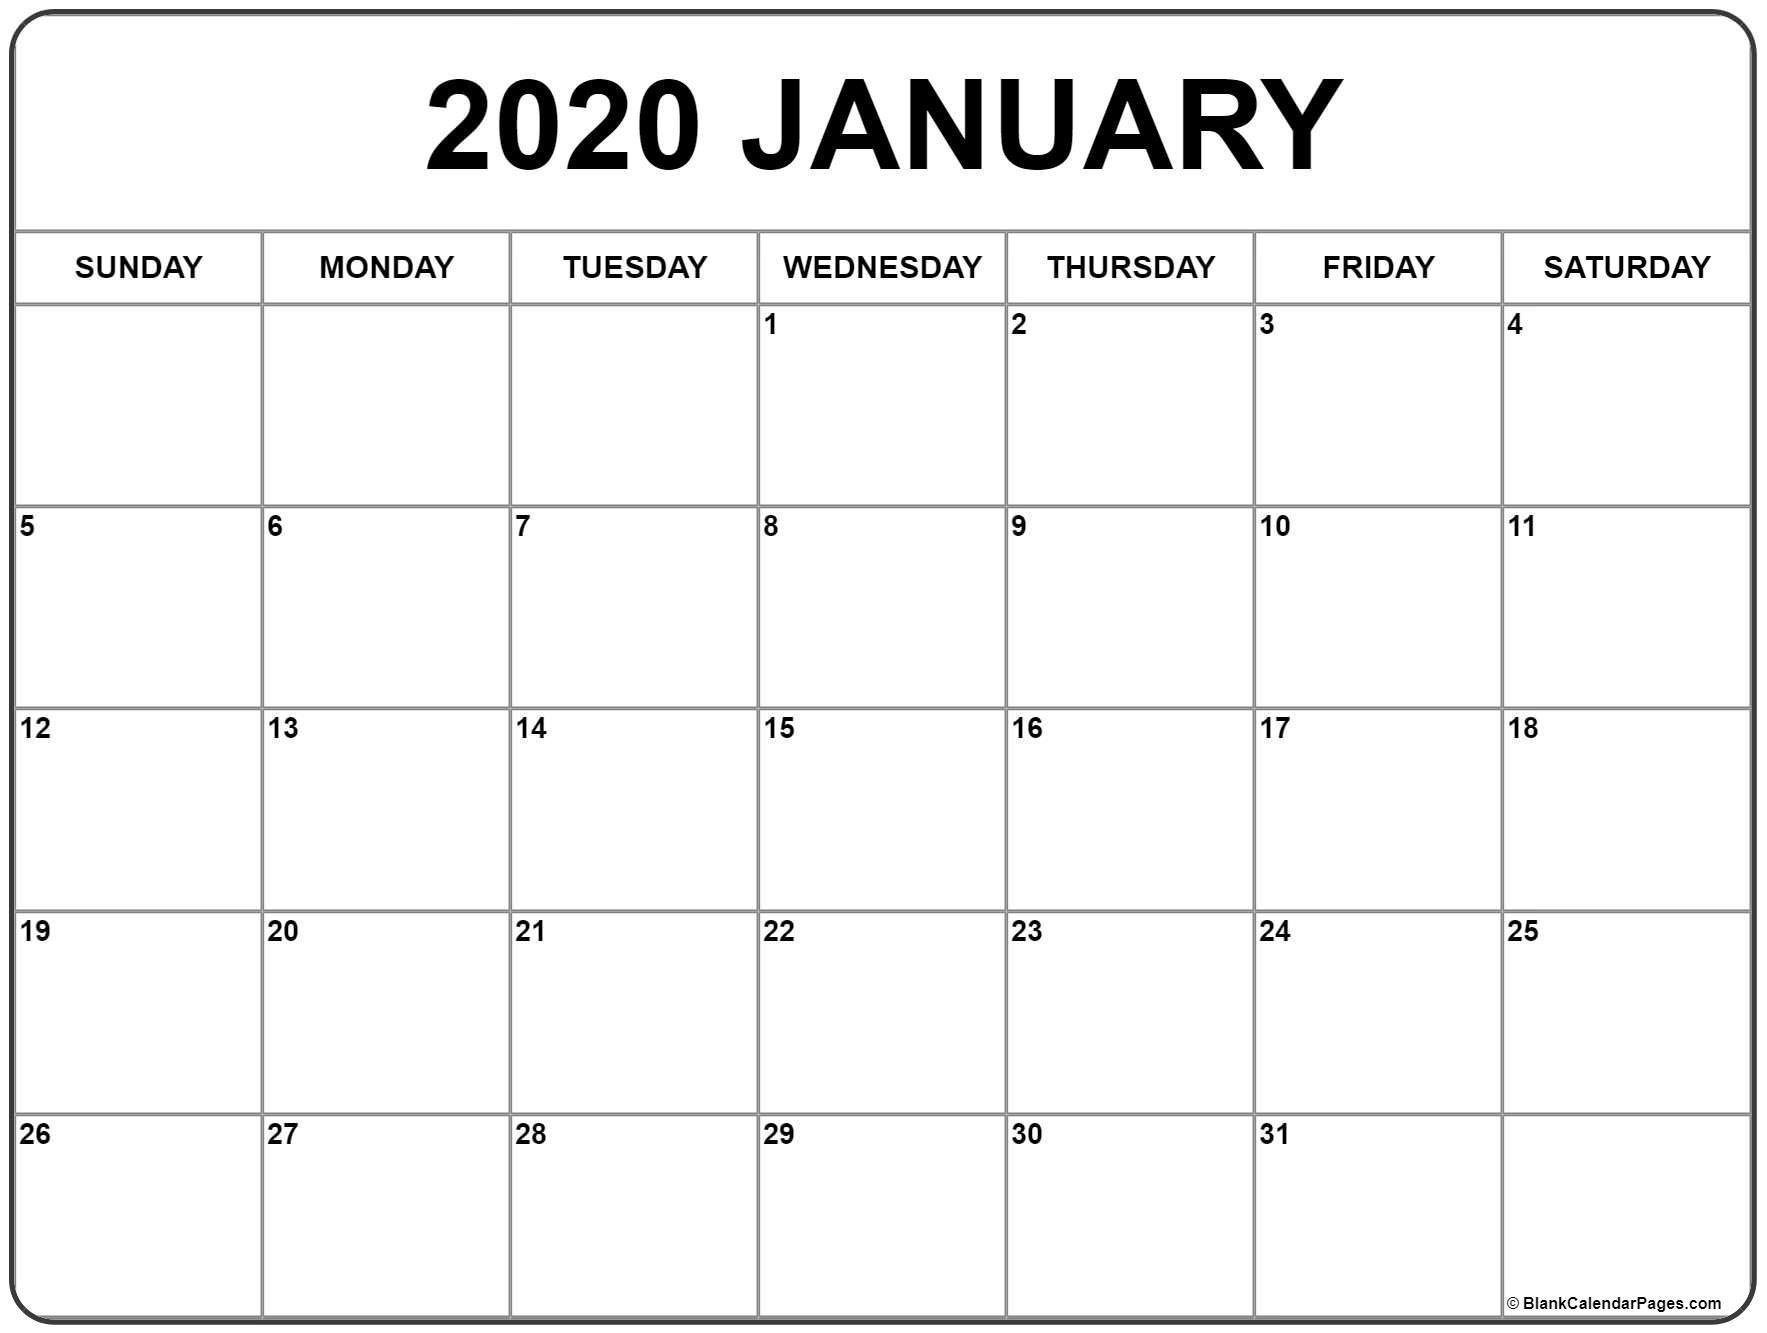 January 2020 Calendar | Free Printable Monthly Calendars throughout 2020 Calendar Free Printable